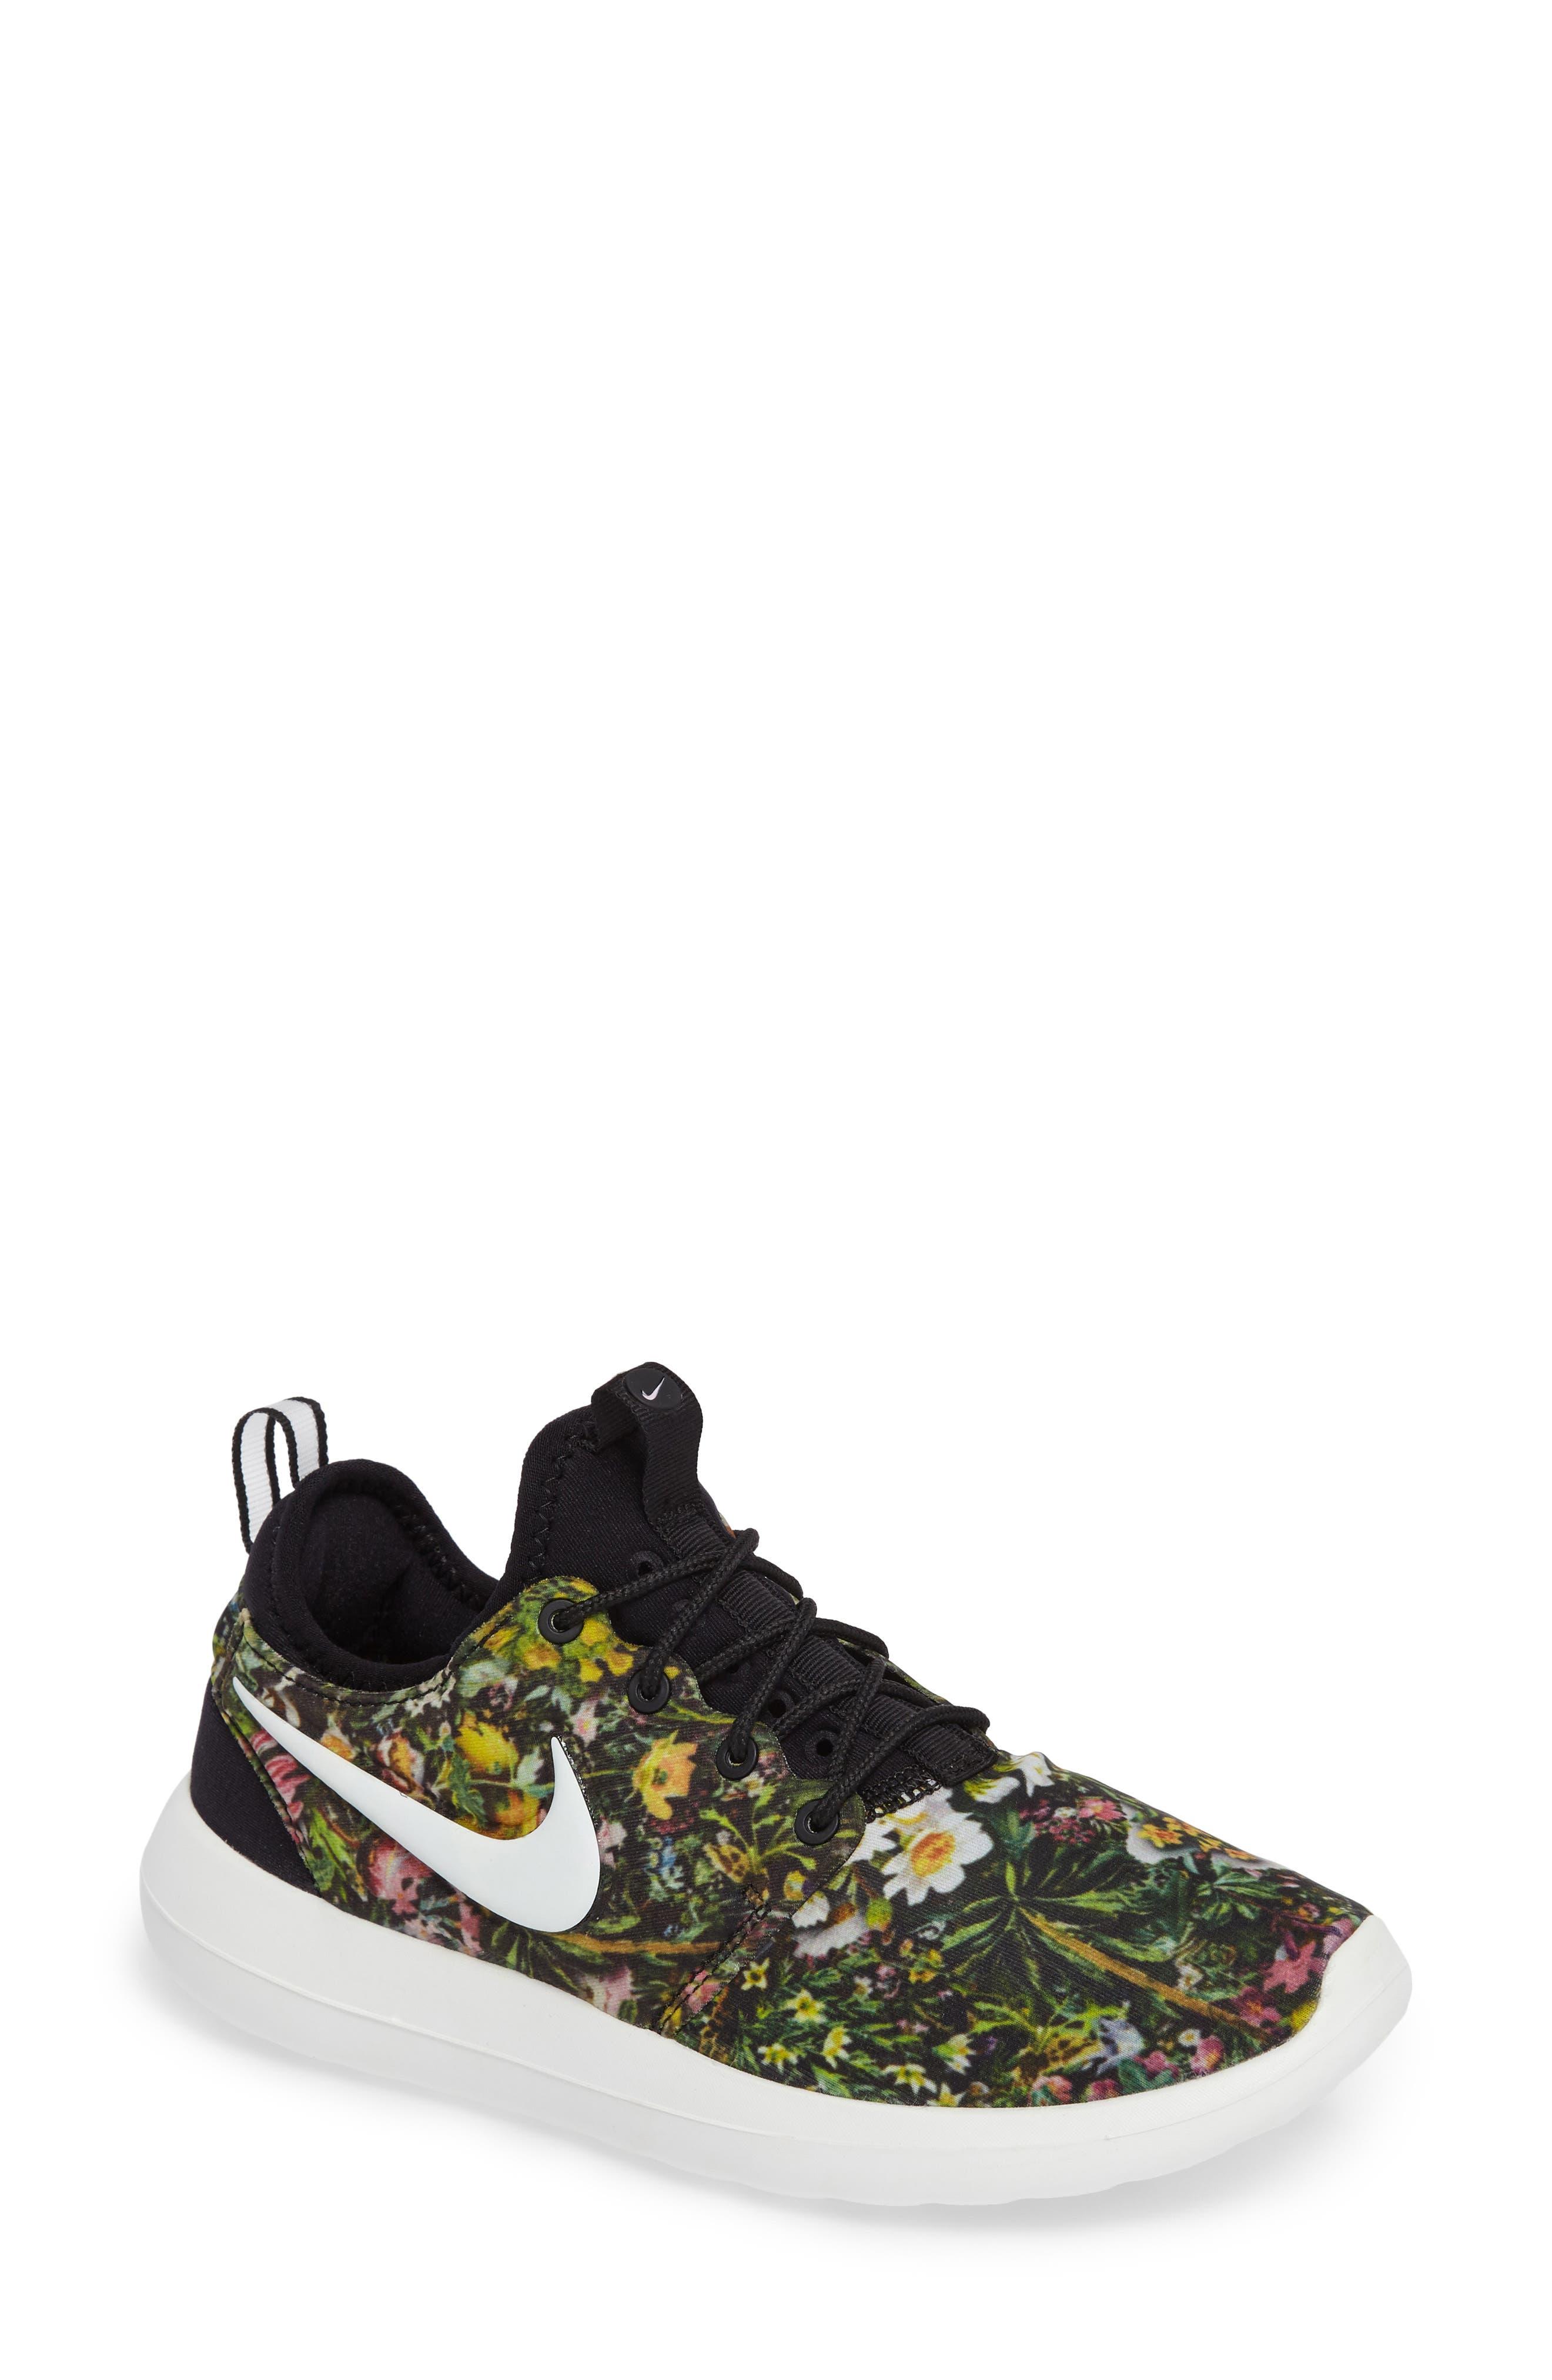 Nike Roshe Two Flyknit Men's Shoe. Nike ID Roshe Two ID, Cheap